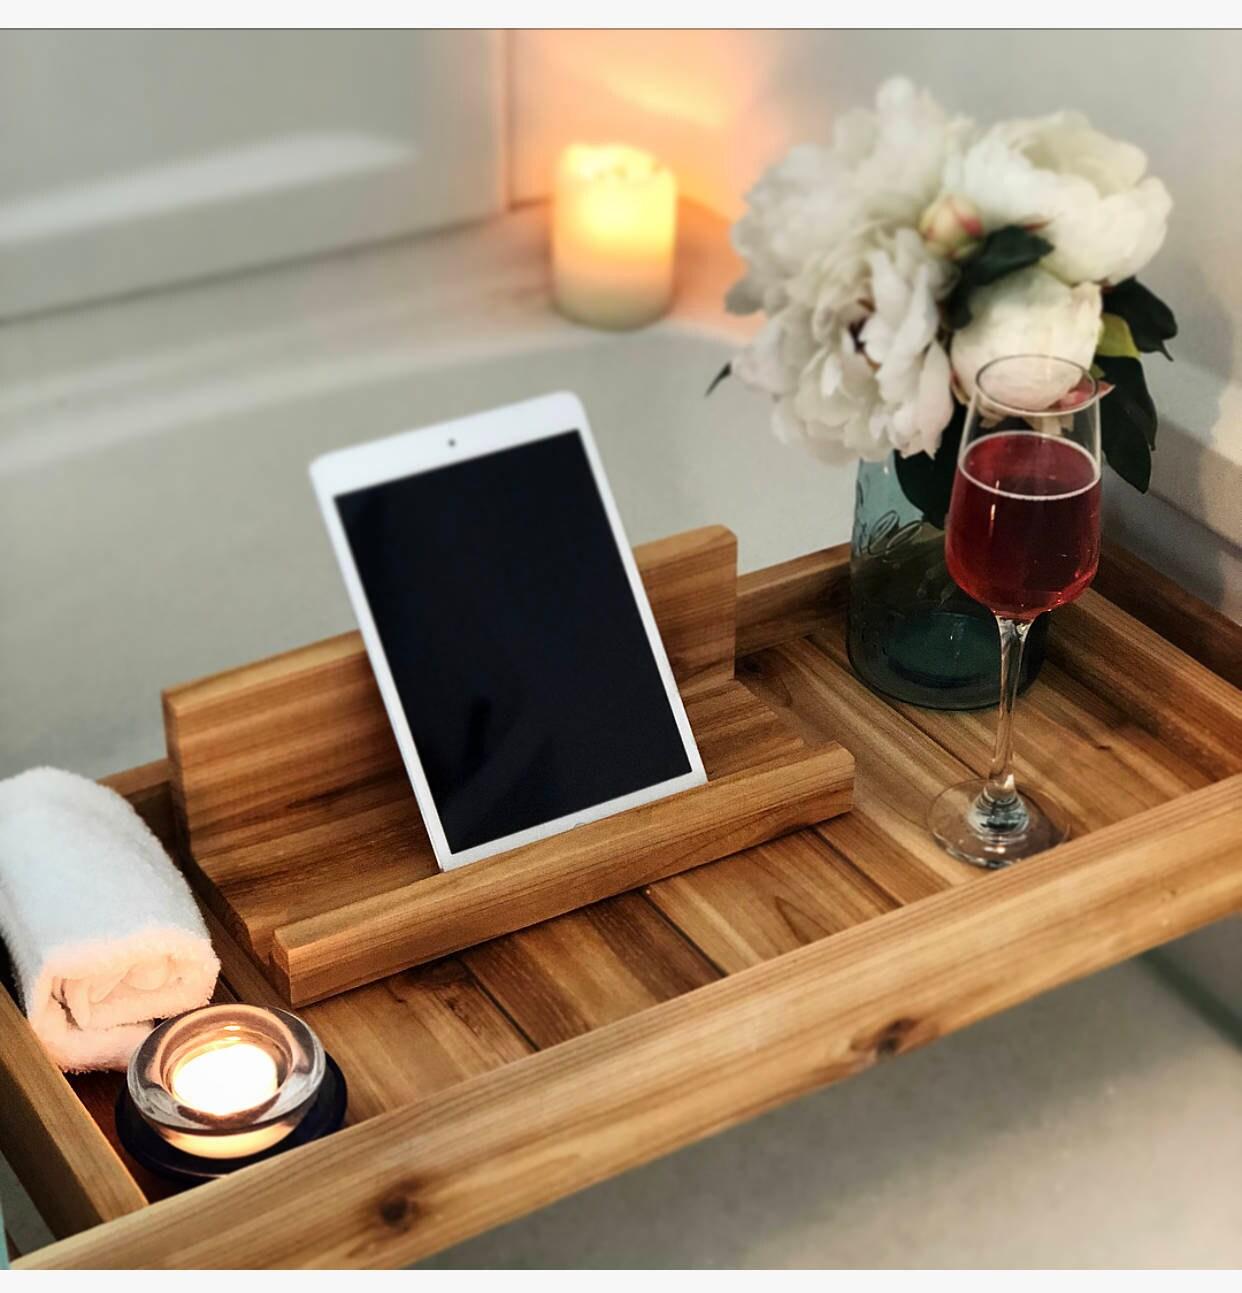 bad bad tablett tablett bad caddy mit ipad halter holz. Black Bedroom Furniture Sets. Home Design Ideas